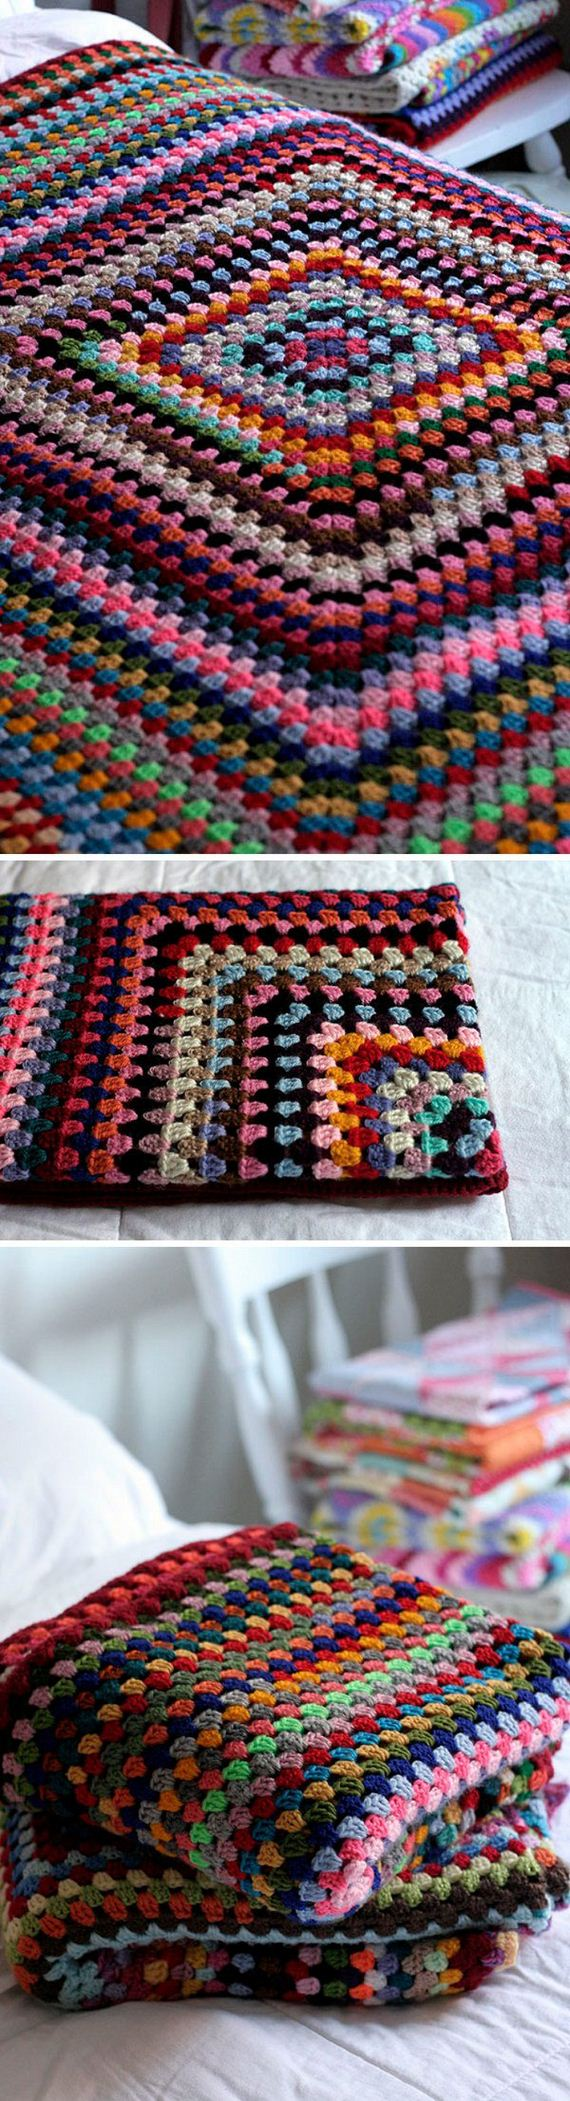 02-cool-easy-crochet-blankets